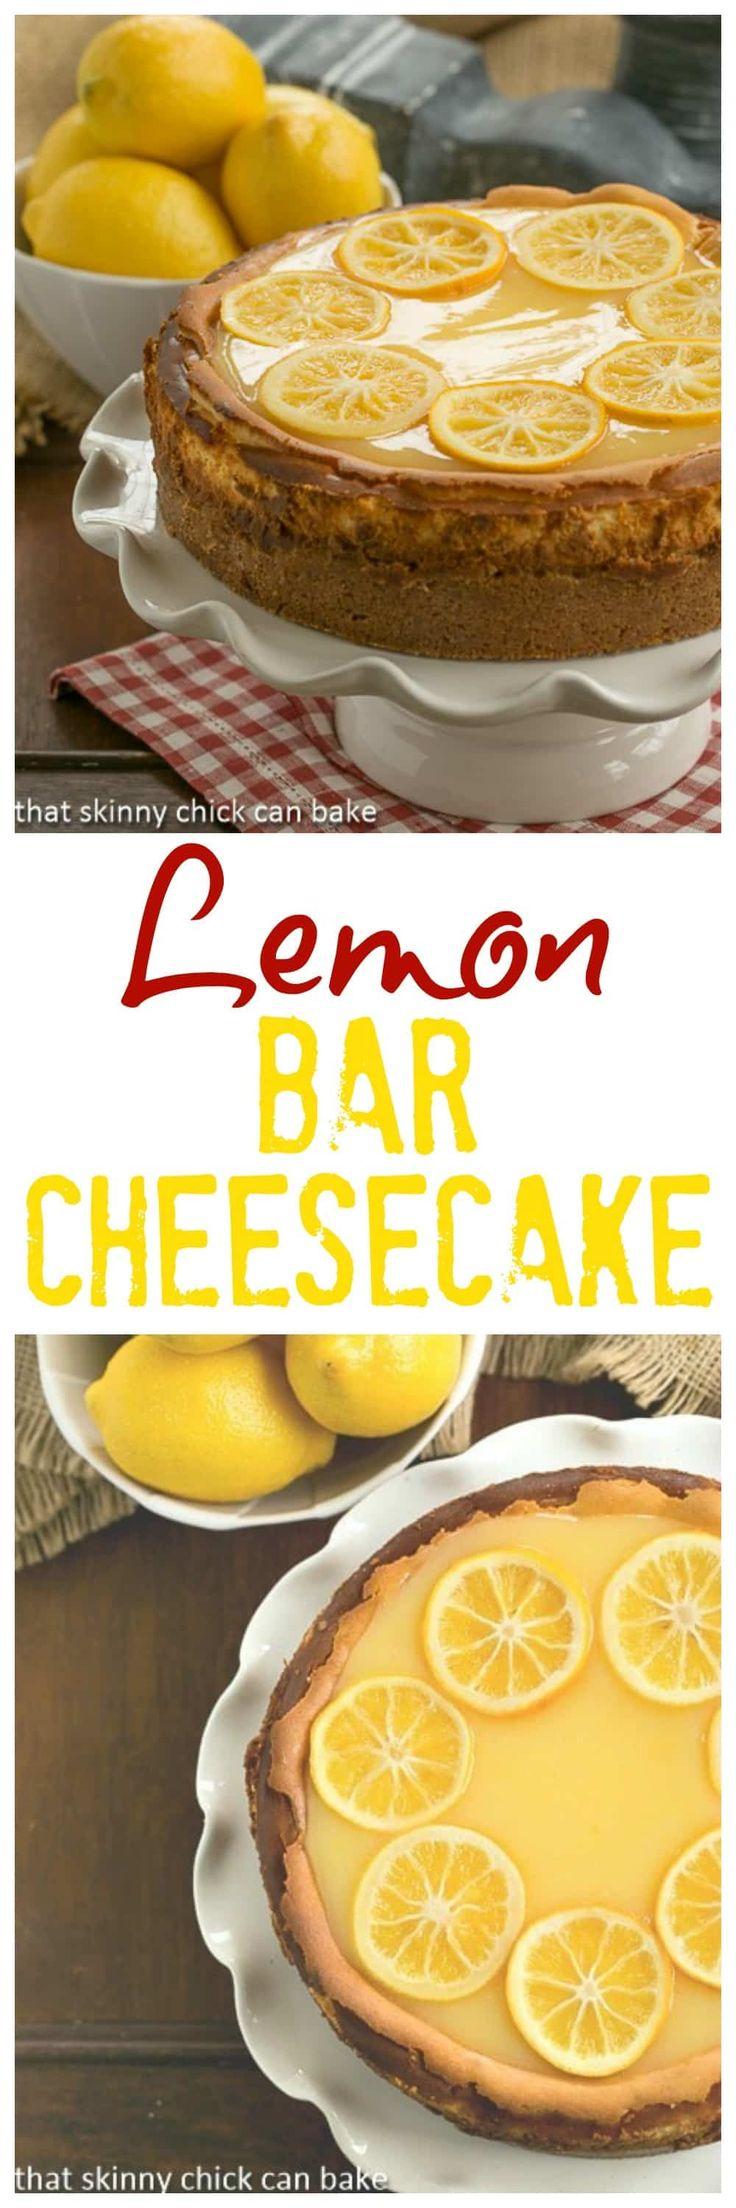 Lemon Bar Cheesecake   A luscious citrus cheesecake loaded with lemon curd #citrus #lemondessertski